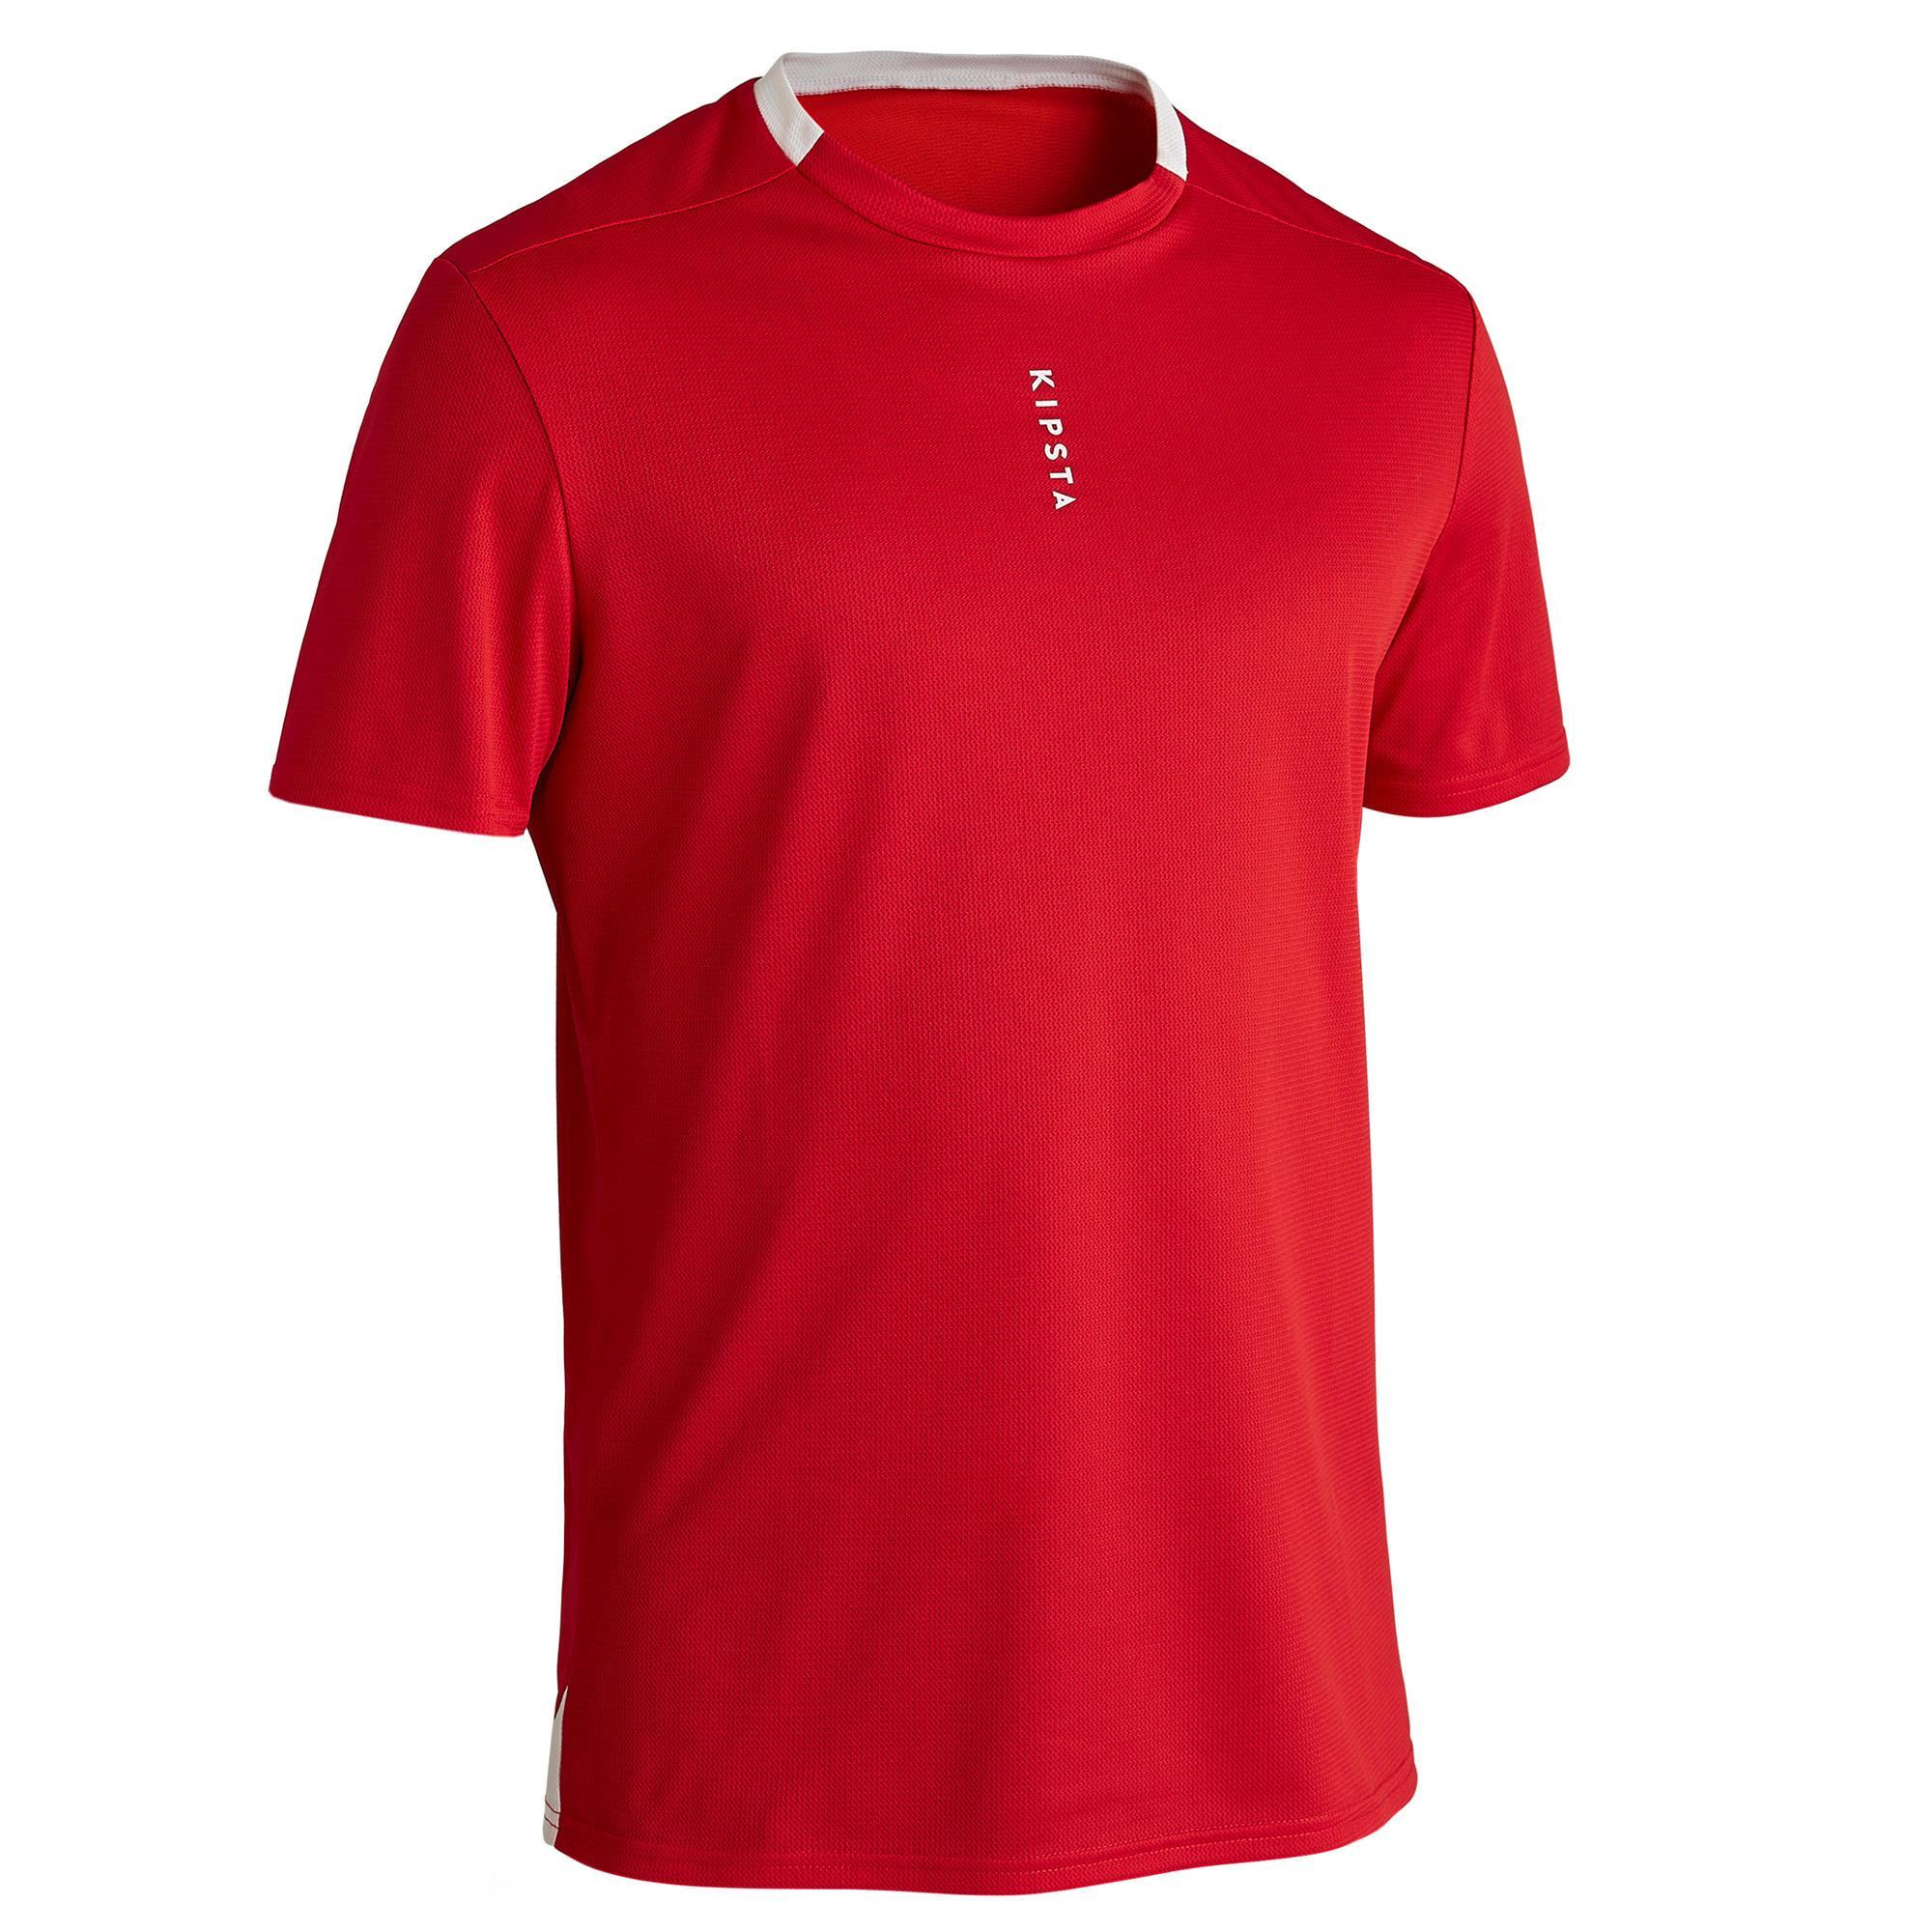 Kipsta Voetbalshirt F100 rood